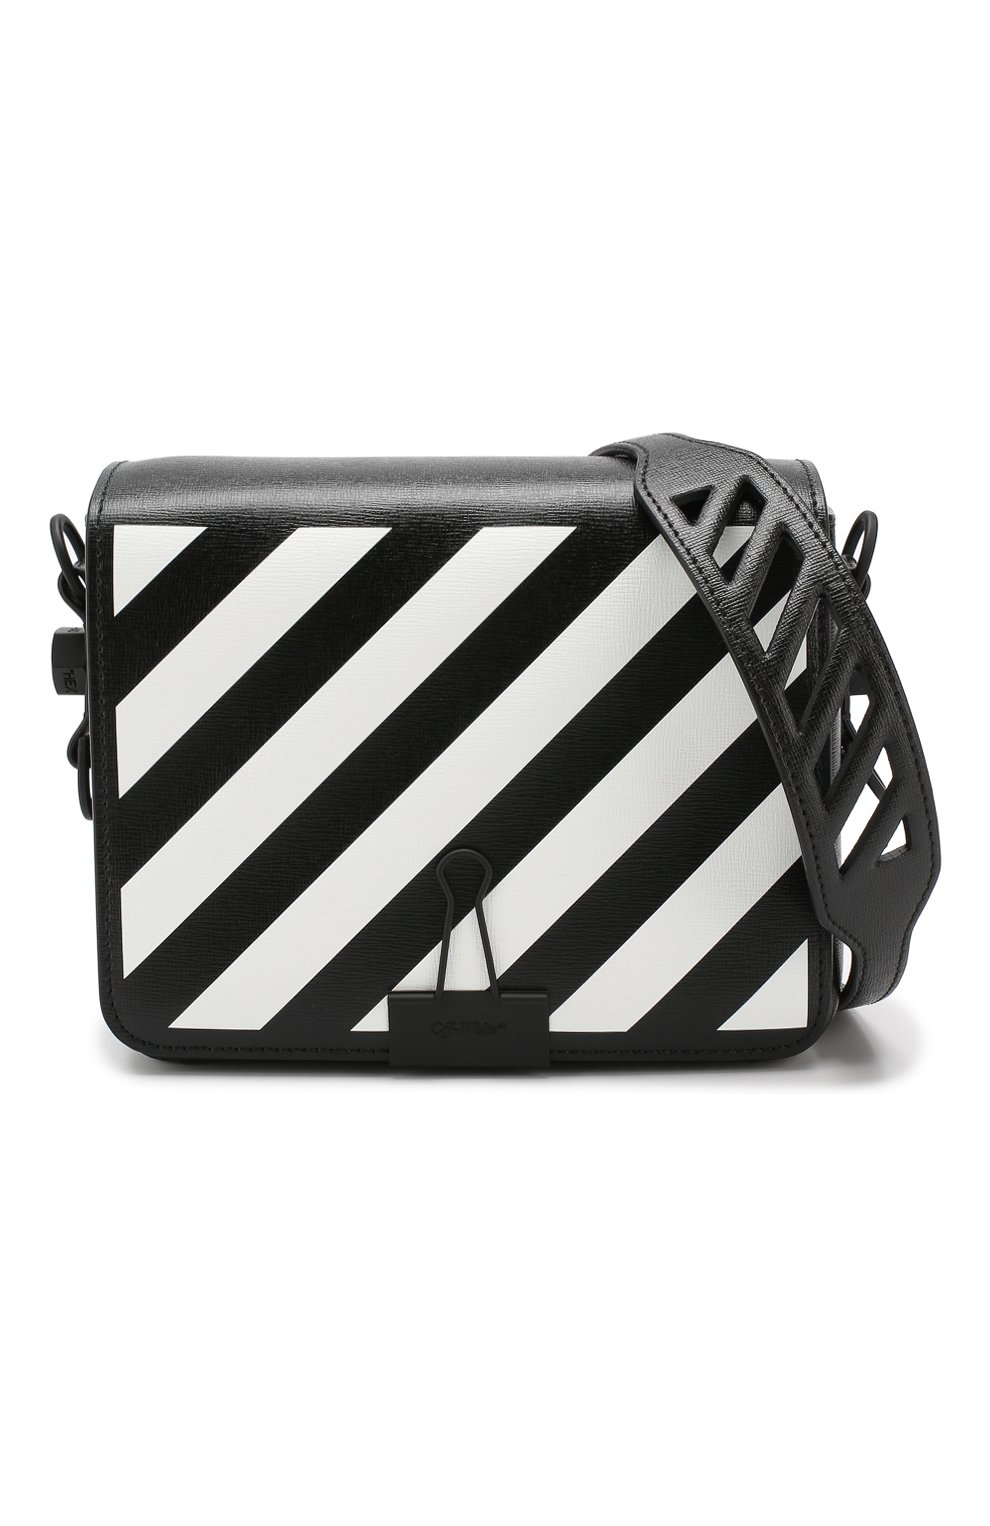 Сумка Diag Binder Clip Off-White черная цвета | Фото №6